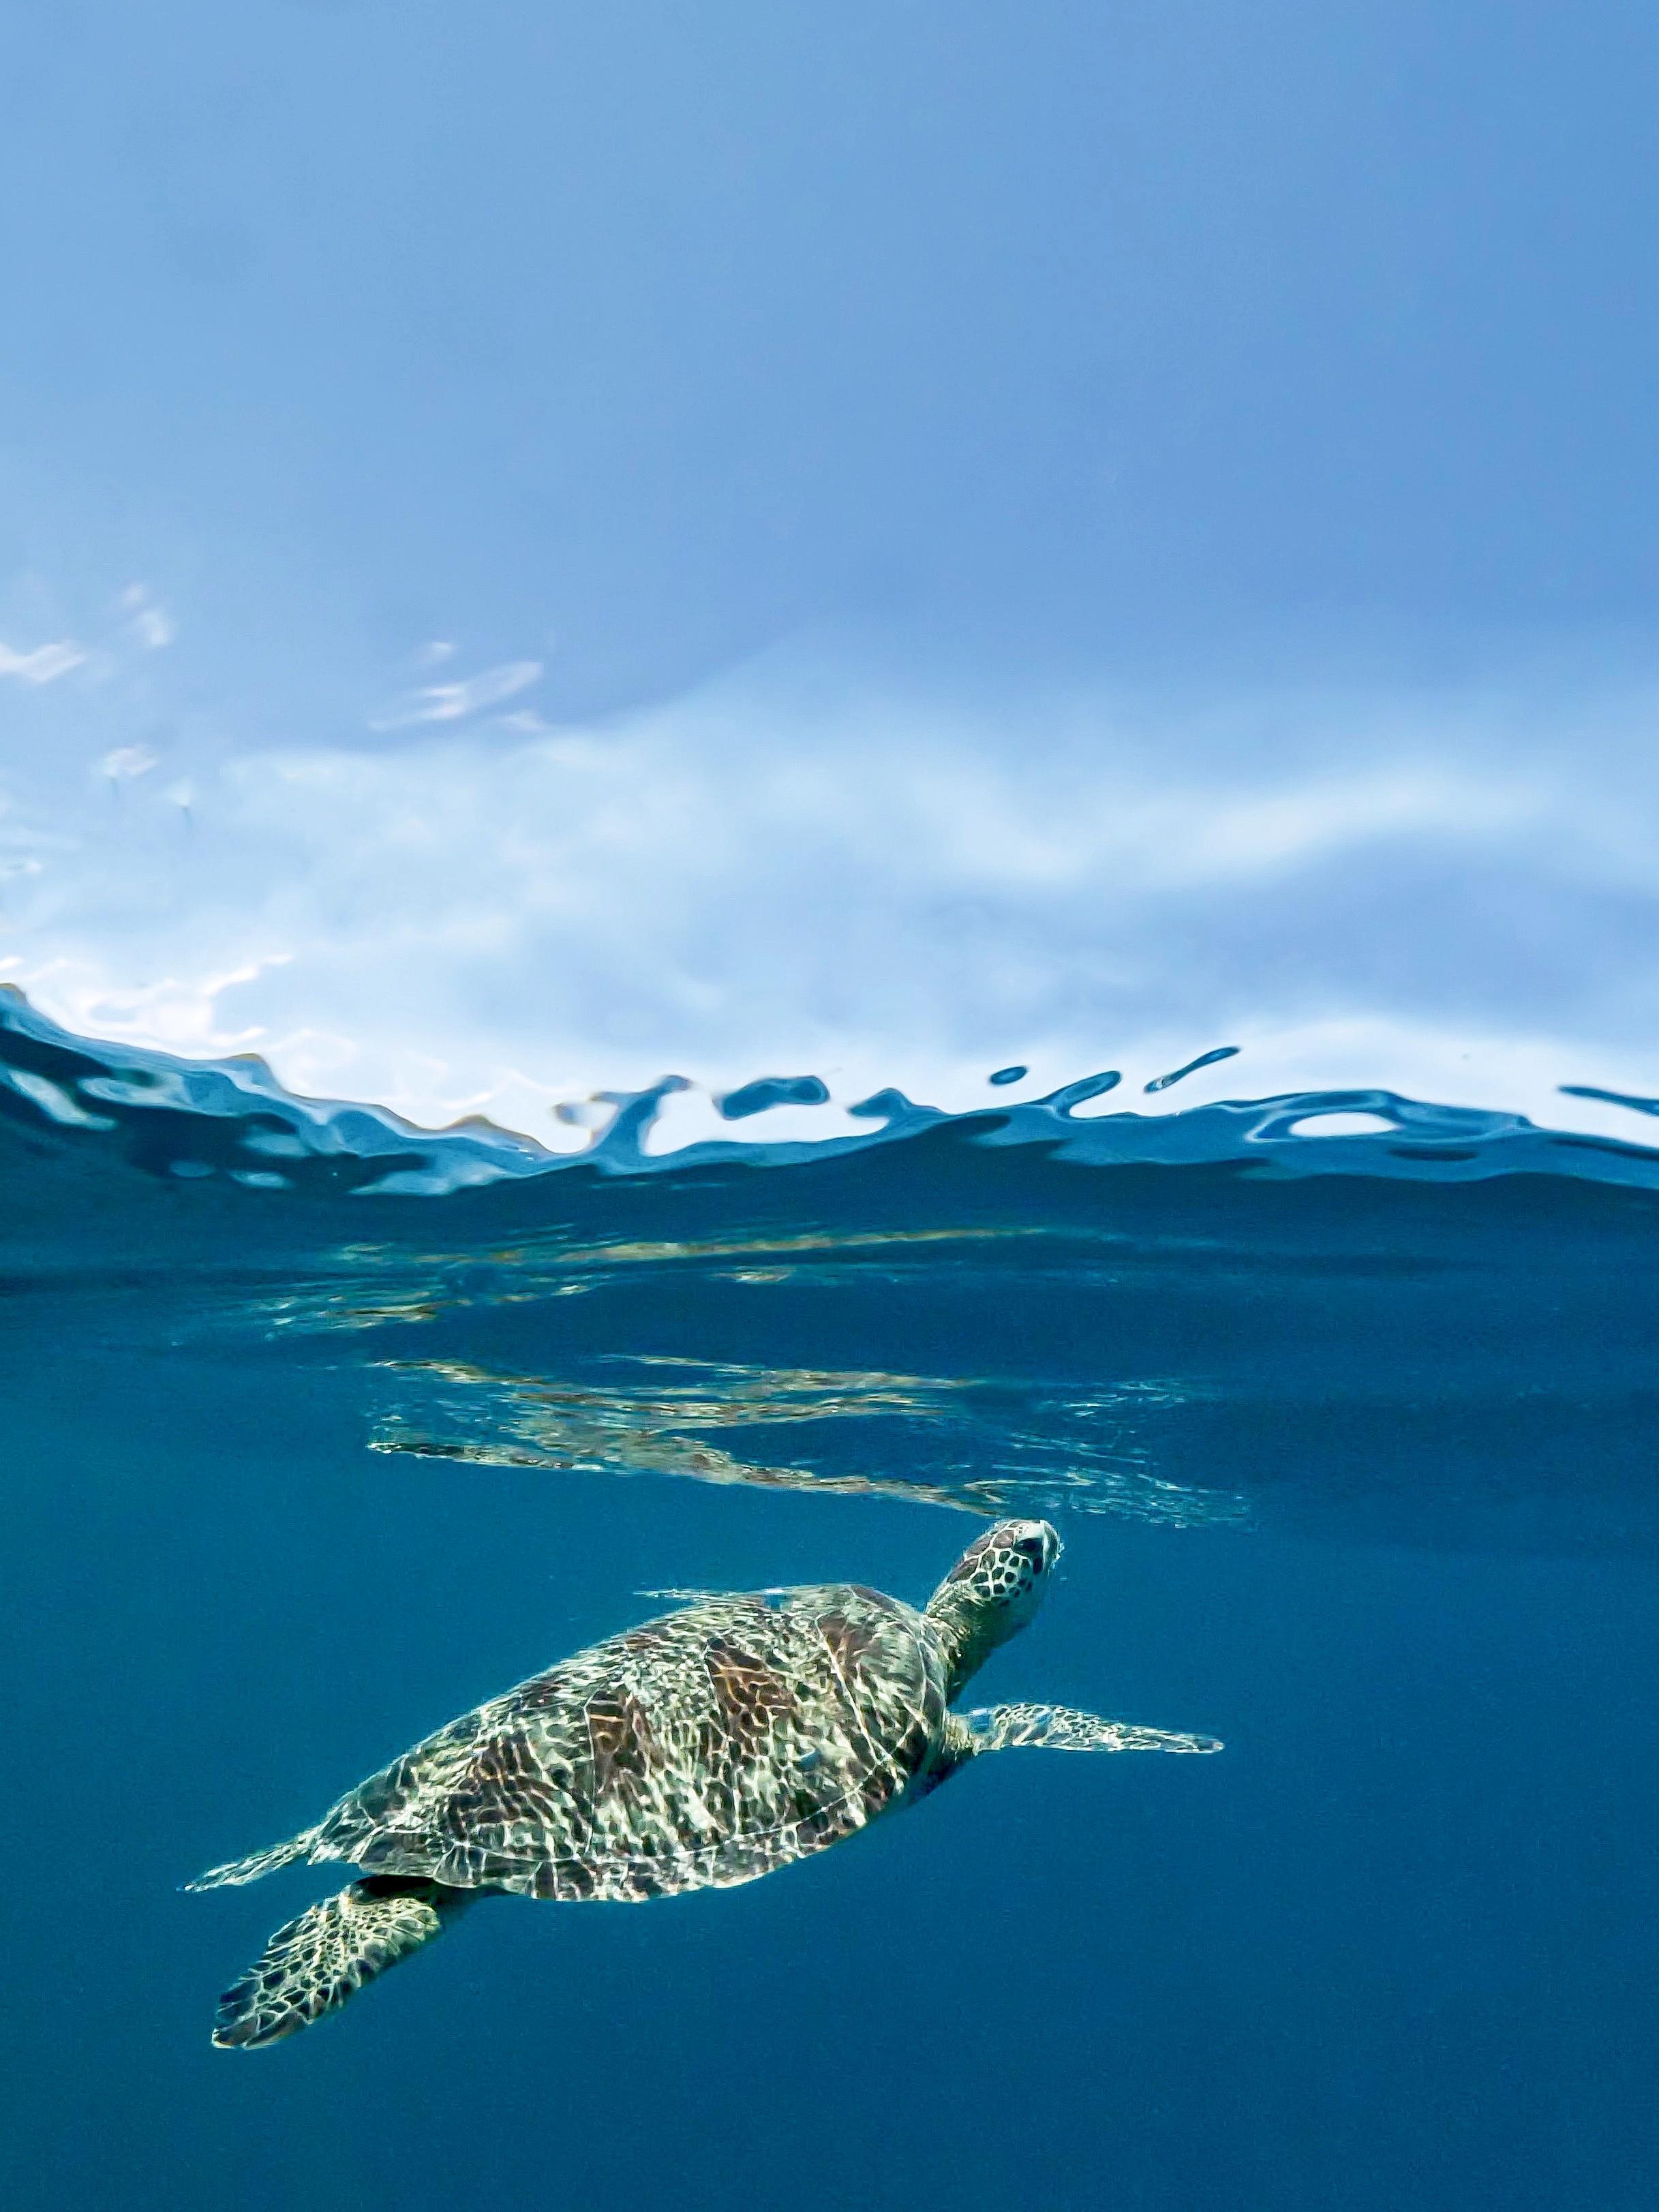 © Serge MELESAN, France, entry, Open competition, Natural World & Wildlife, 2021 Sony World Photography Awards